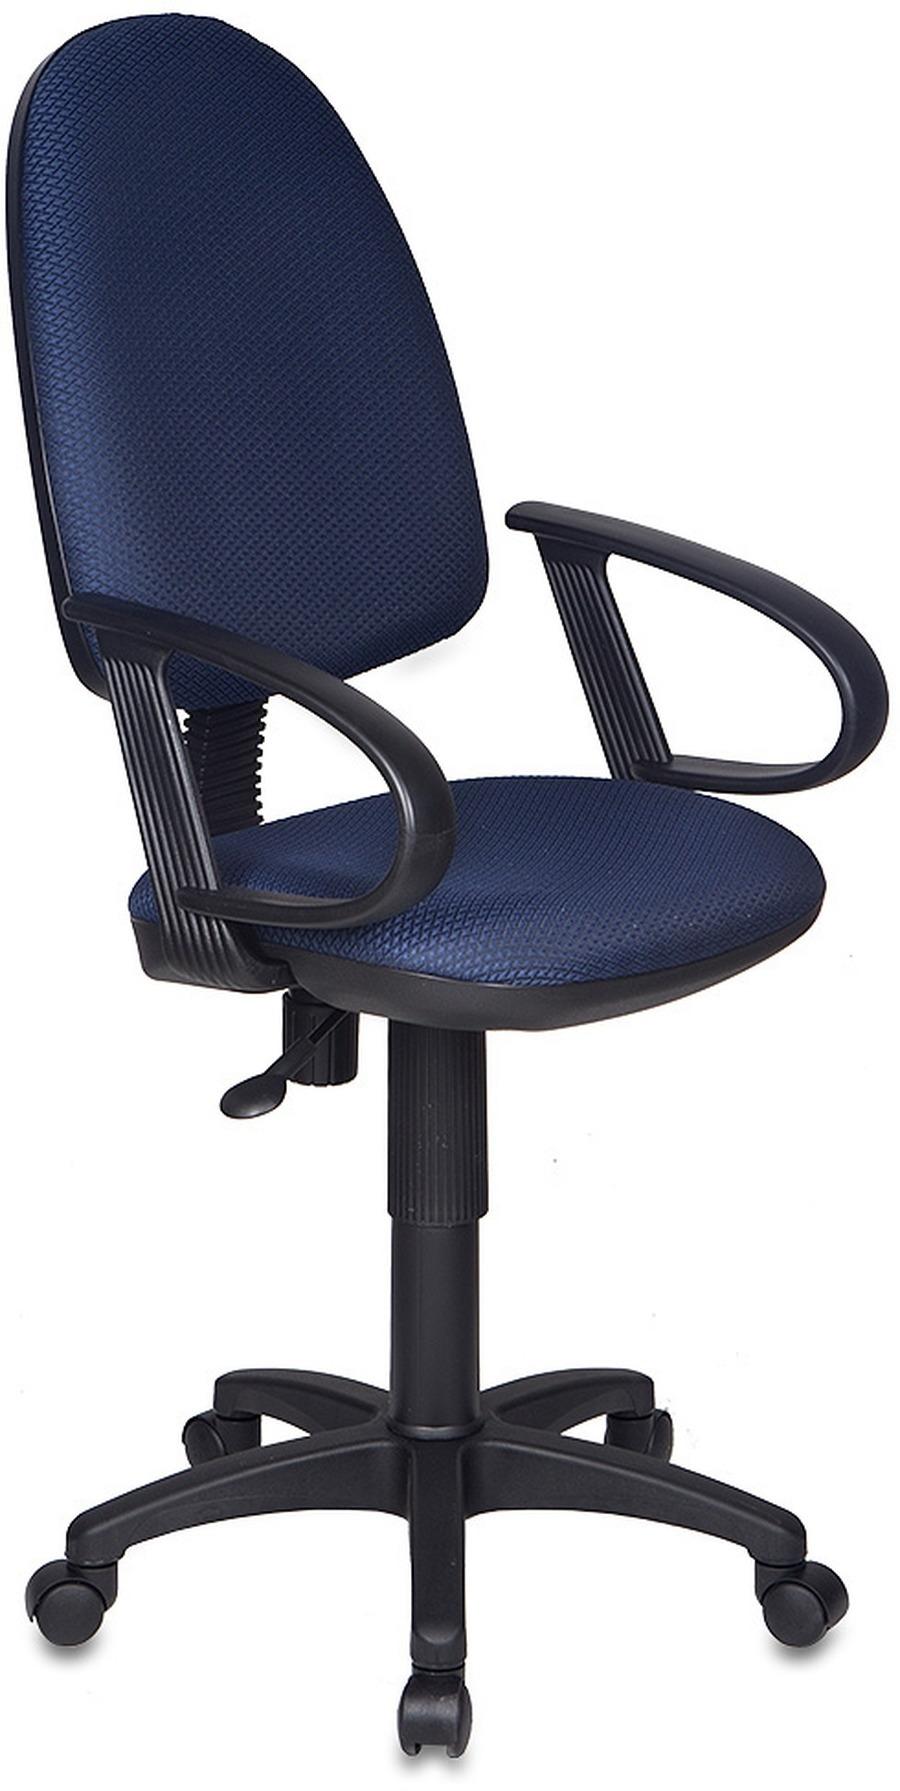 Офисное кресло CH 300 AXSNКабинет<br><br><br>Длина мм: 1110<br>Высота мм: 560<br>Глубина мм: 450